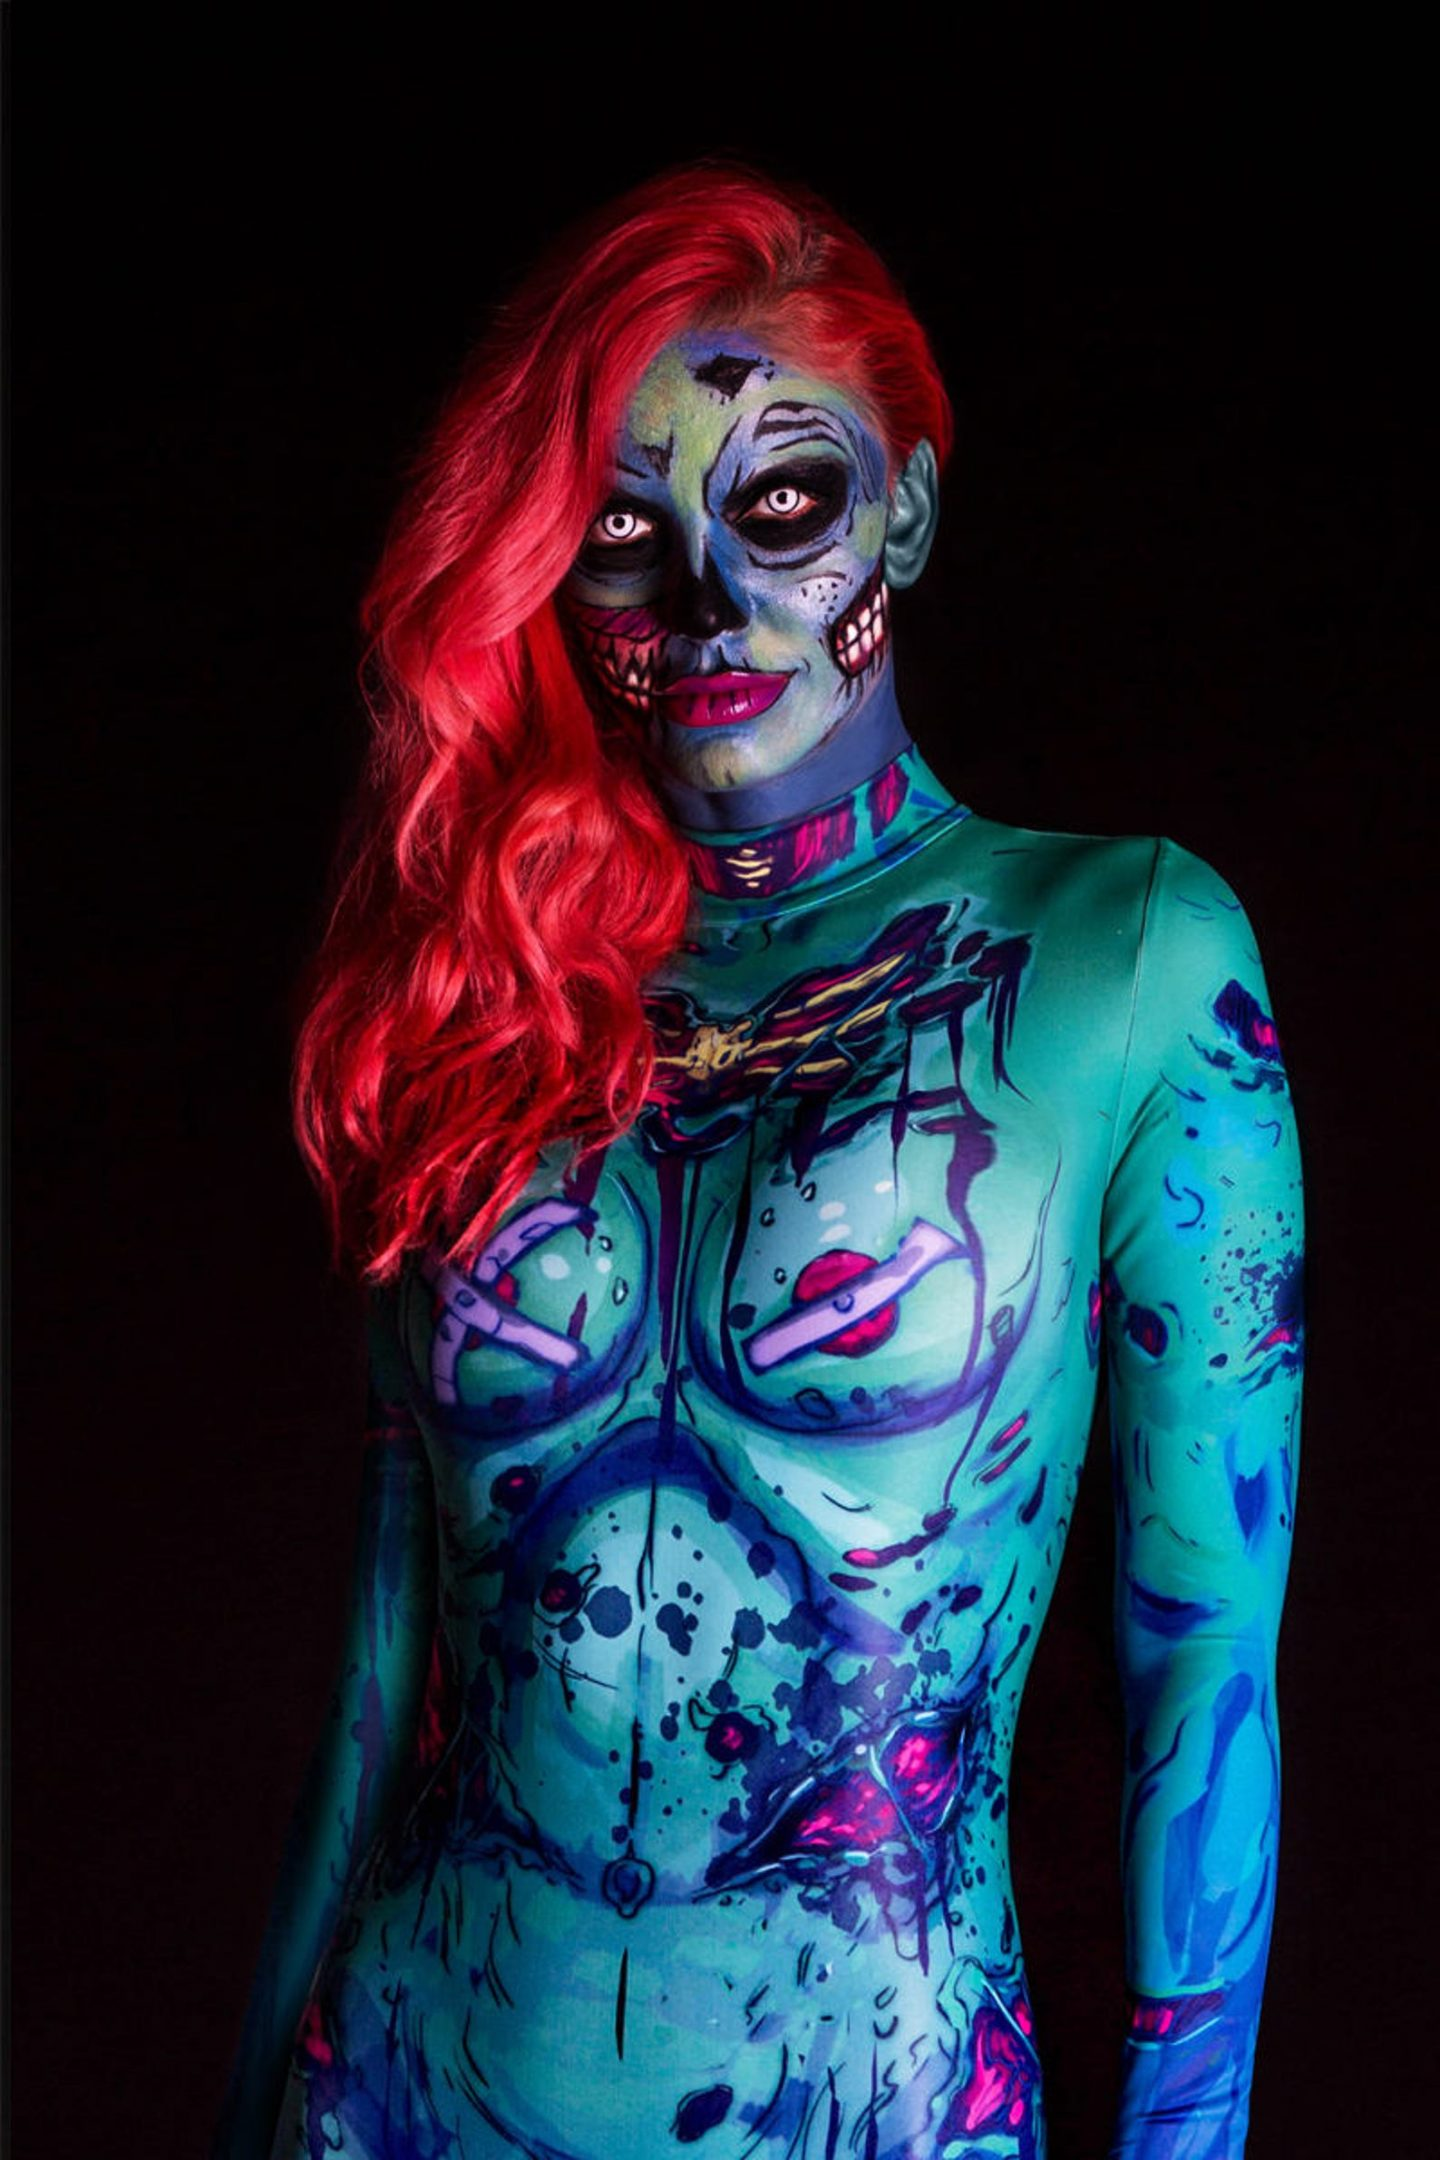 Zombie Halloween costume for women